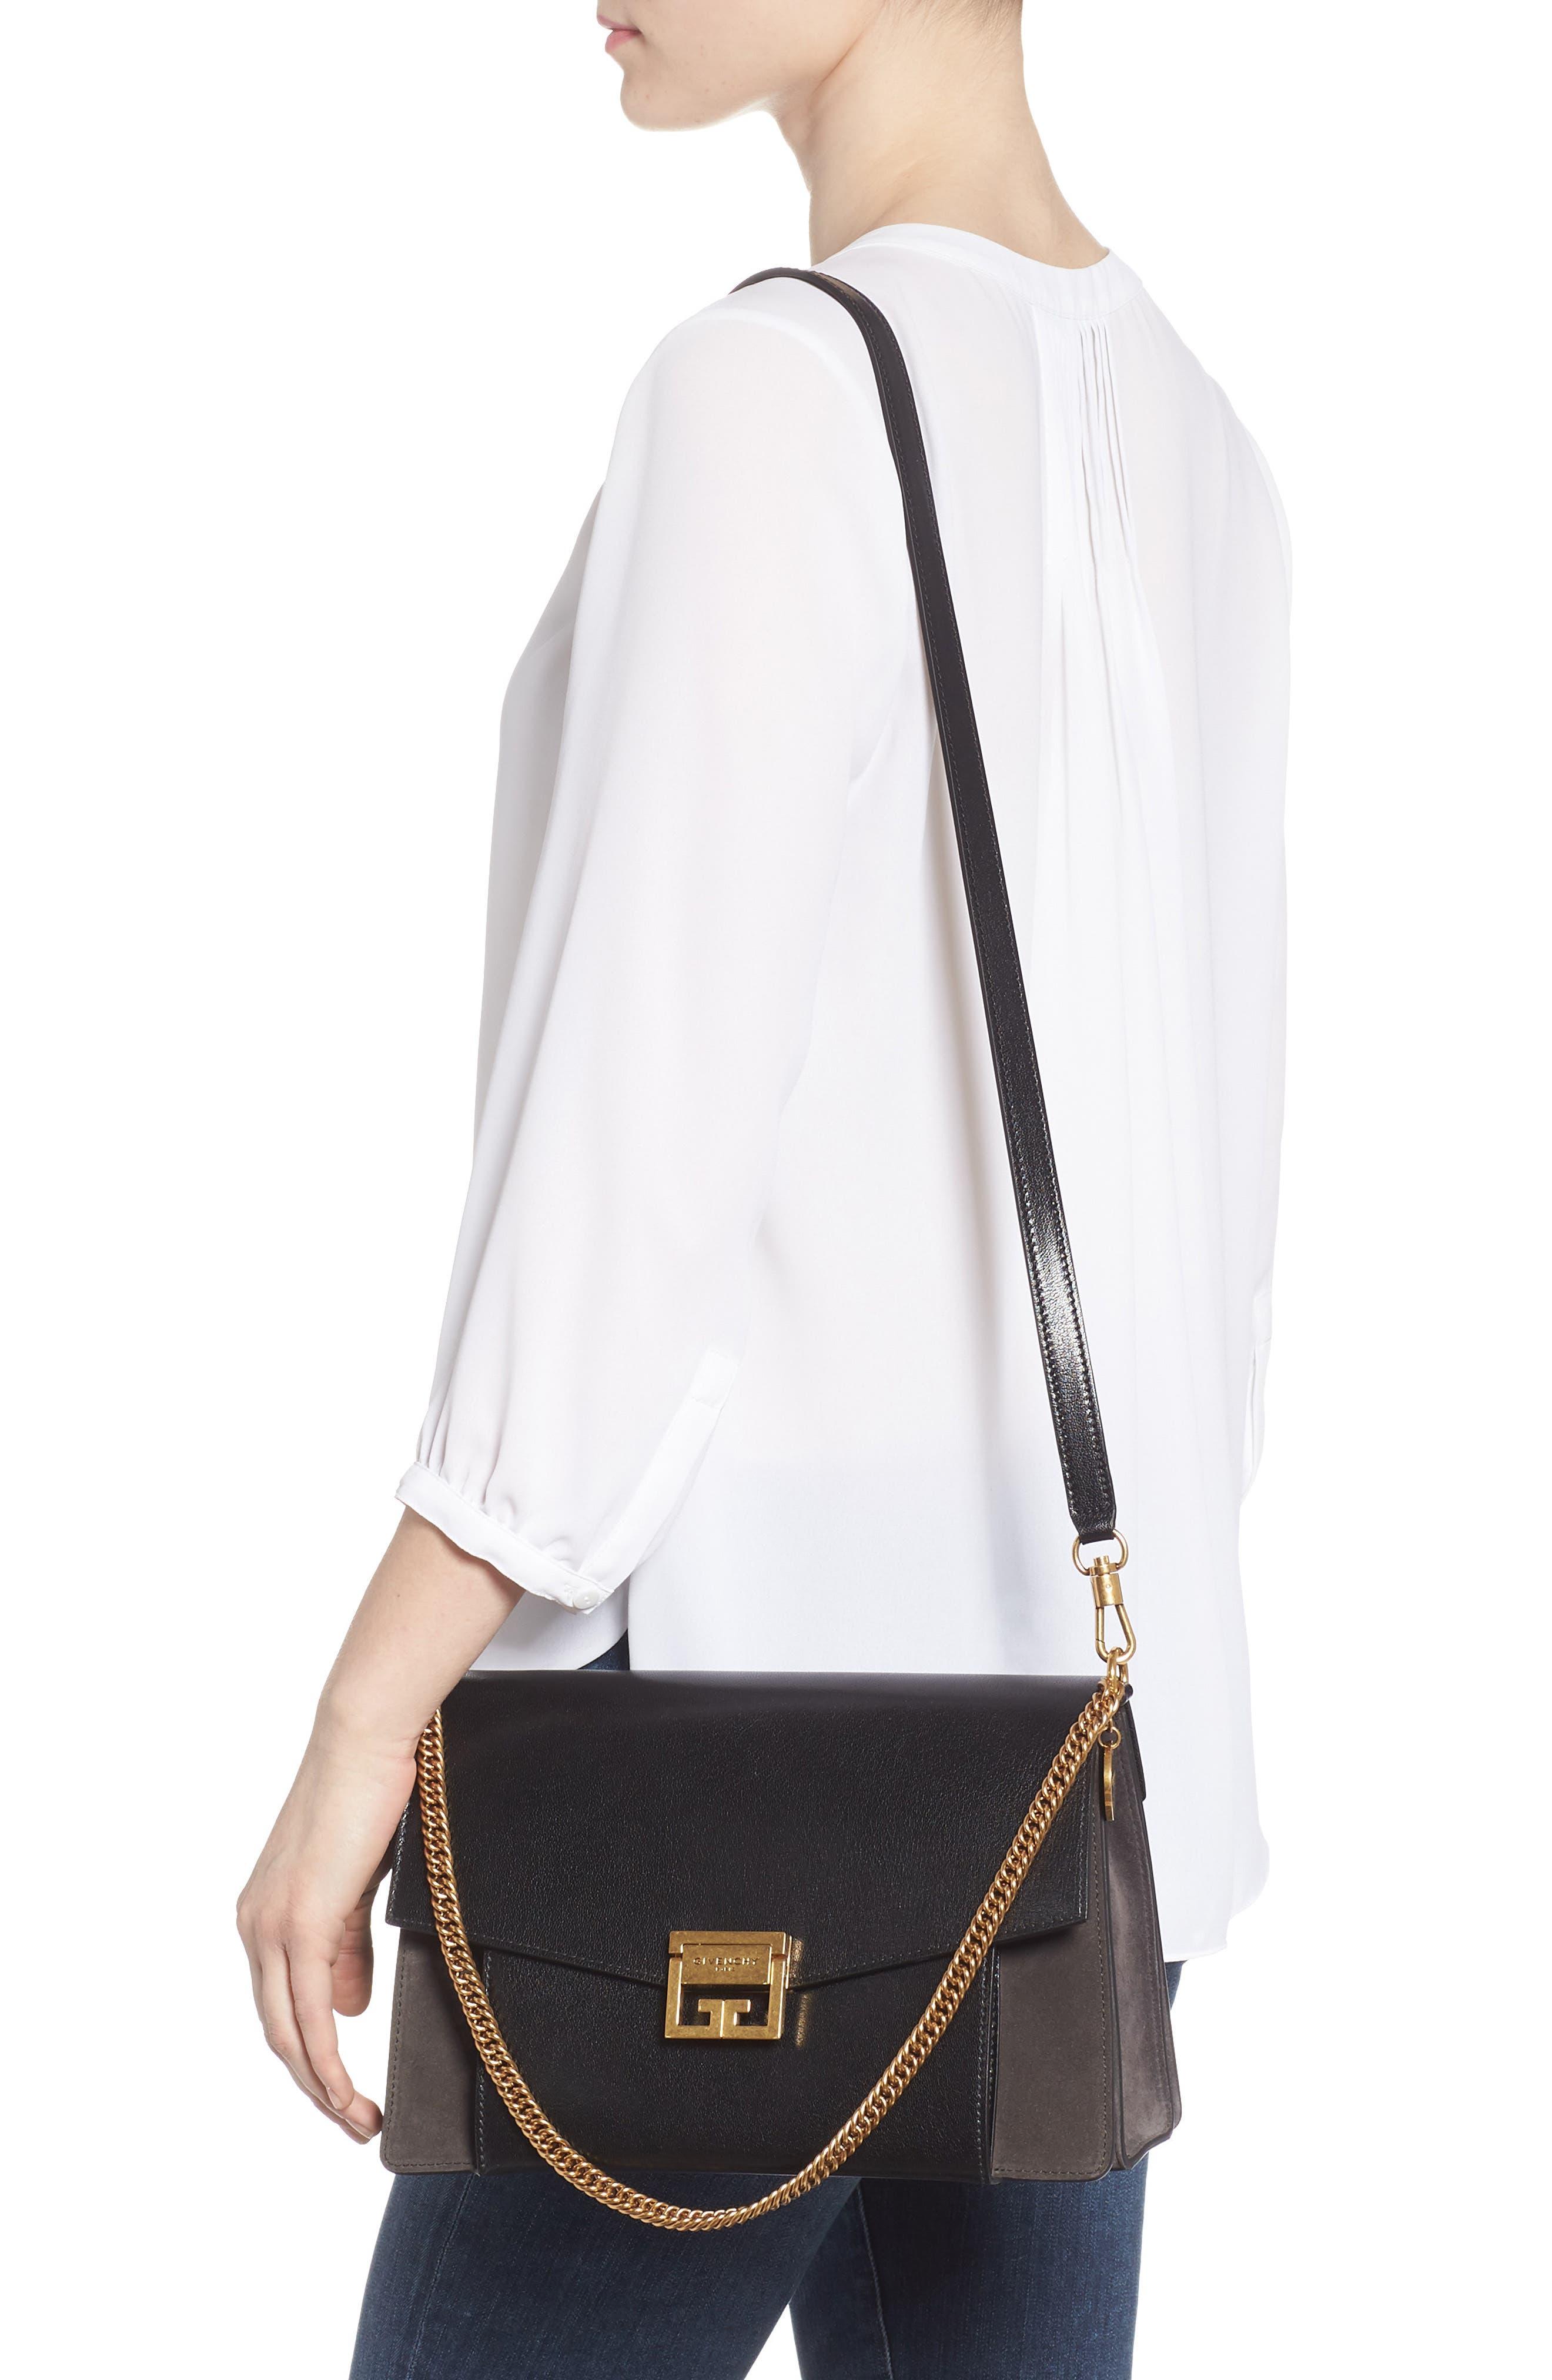 Medium GV3 Leather Crossbody Bag,                             Alternate thumbnail 2, color,                             BLACK/ GREY